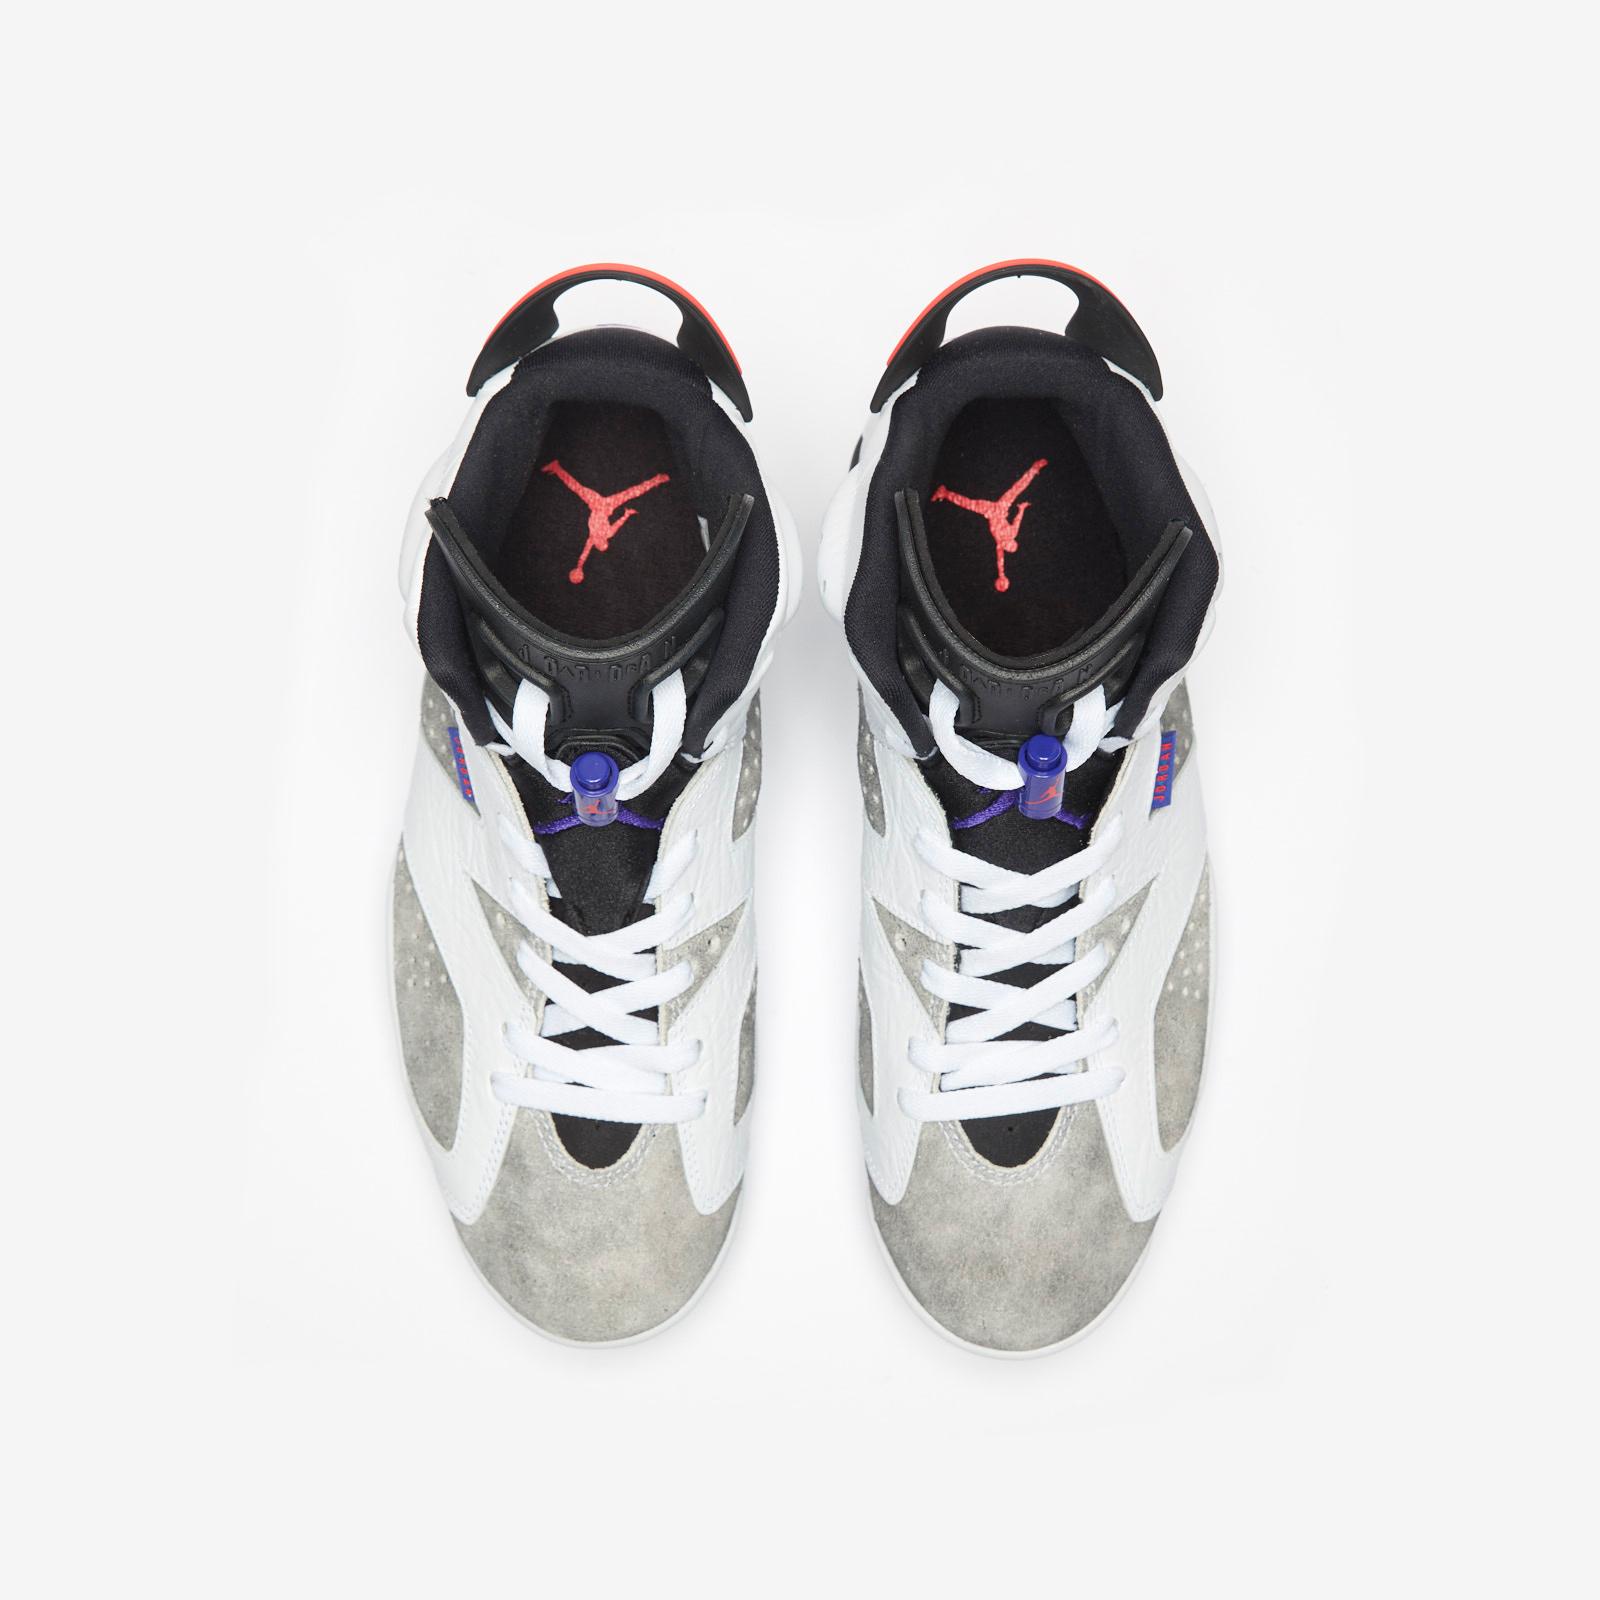 Jordan Brand Air Jordan 6 Retro LTR - Ci3125-100 - Sneakersnstuff ... 724c9a80c